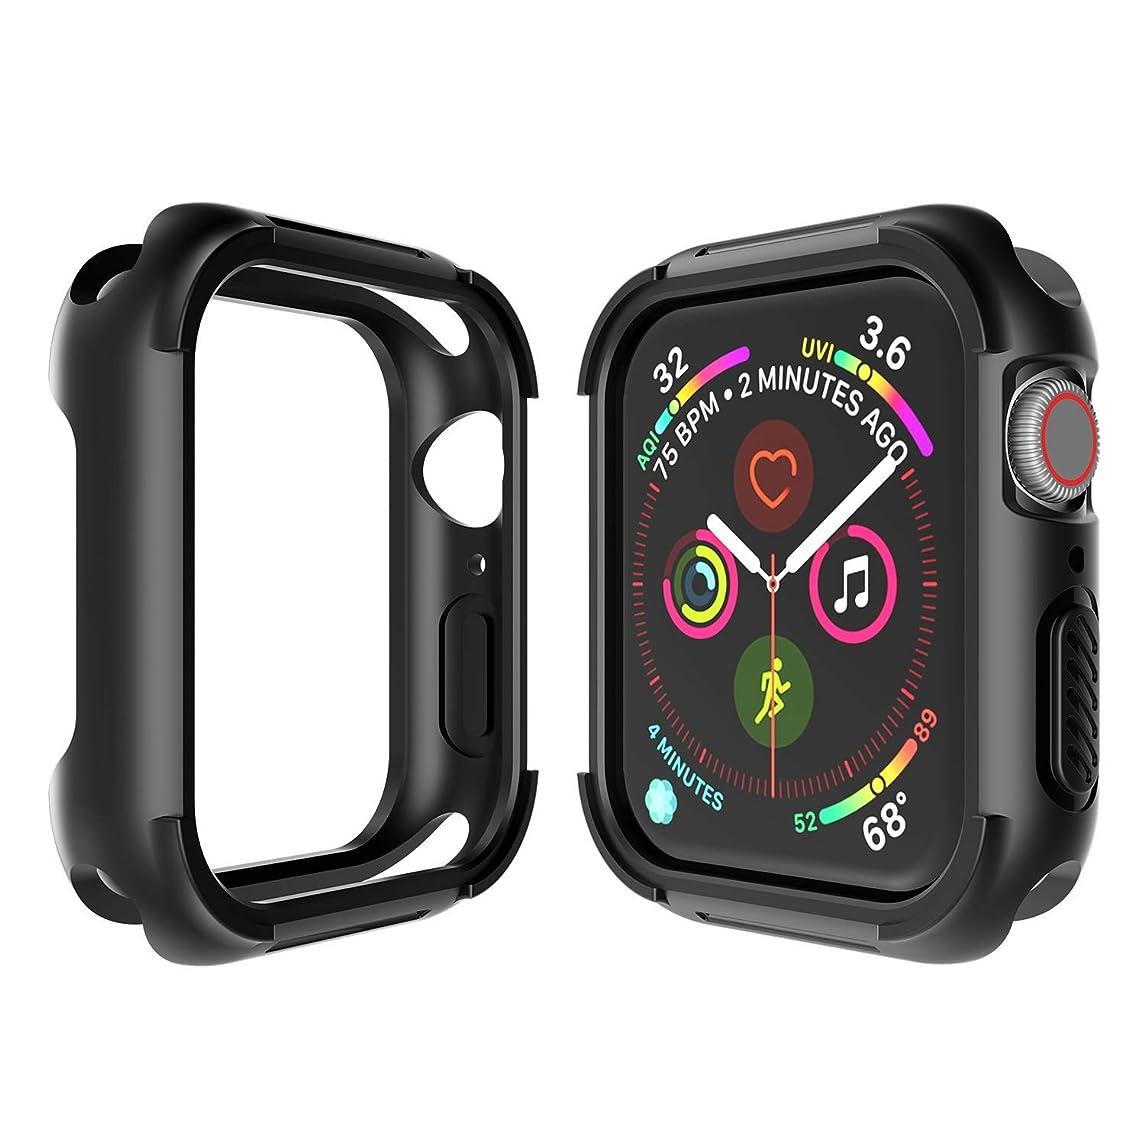 Seiaol Apple Watch series 4 ケース TPU+PC素材 高品質 耐衝撃 アップルウォッチ シリーズ 4 落下防止 保護ケース 着装まま充電可能 Apple Watch Series 4 専用 精密操作 高感度&高級感 防汗防水(44MM, 黒)